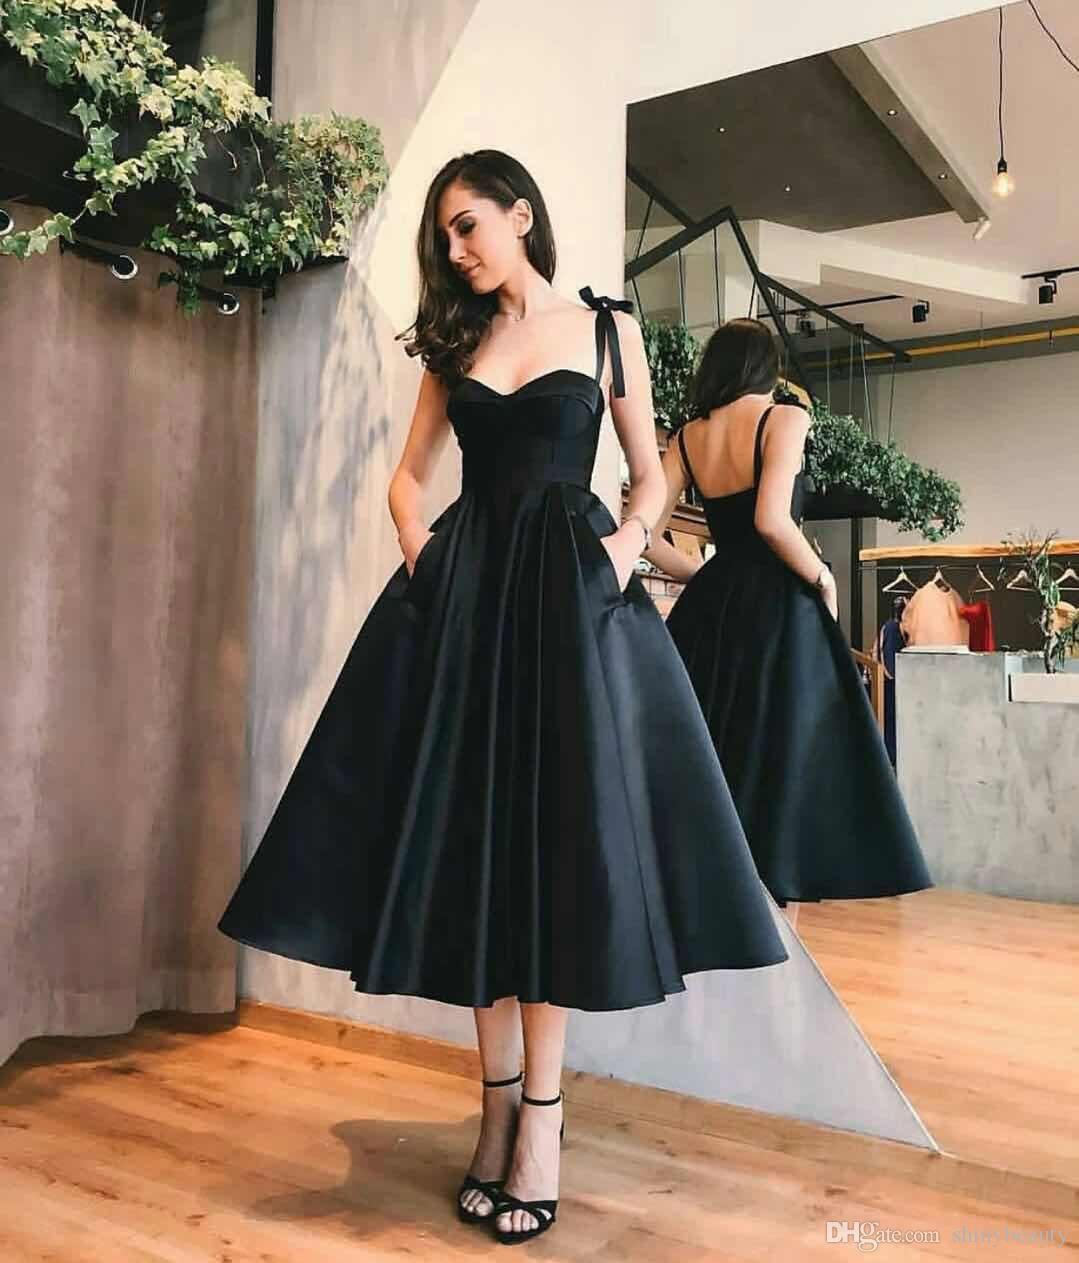 Medium length prom dresses, Cocktail dress